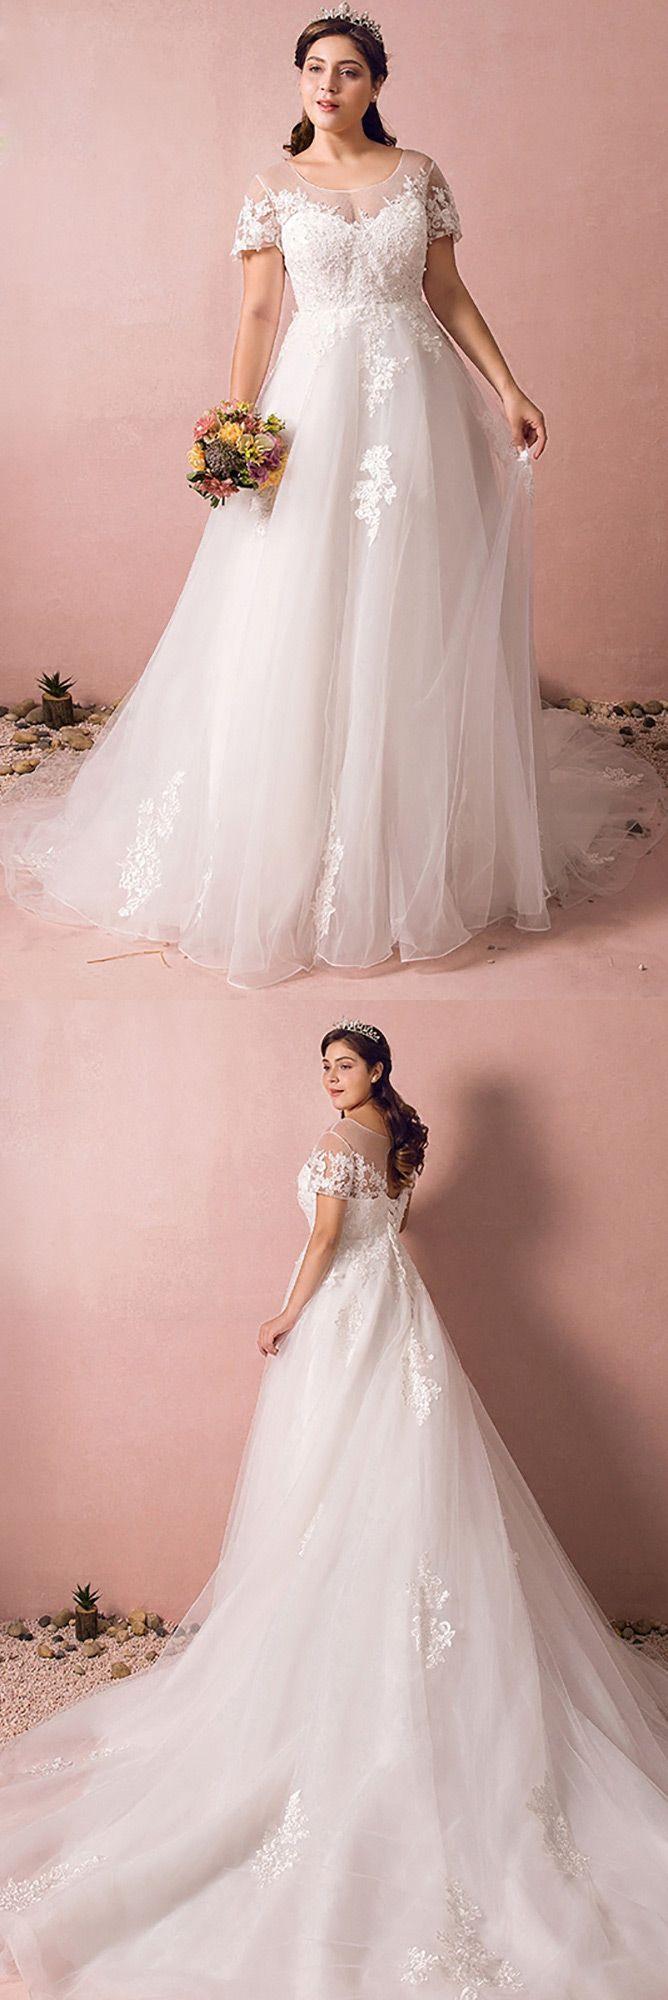 Boho Lace A Line Beach Wedding Dress Plus Size With Sleeves 2018 ...